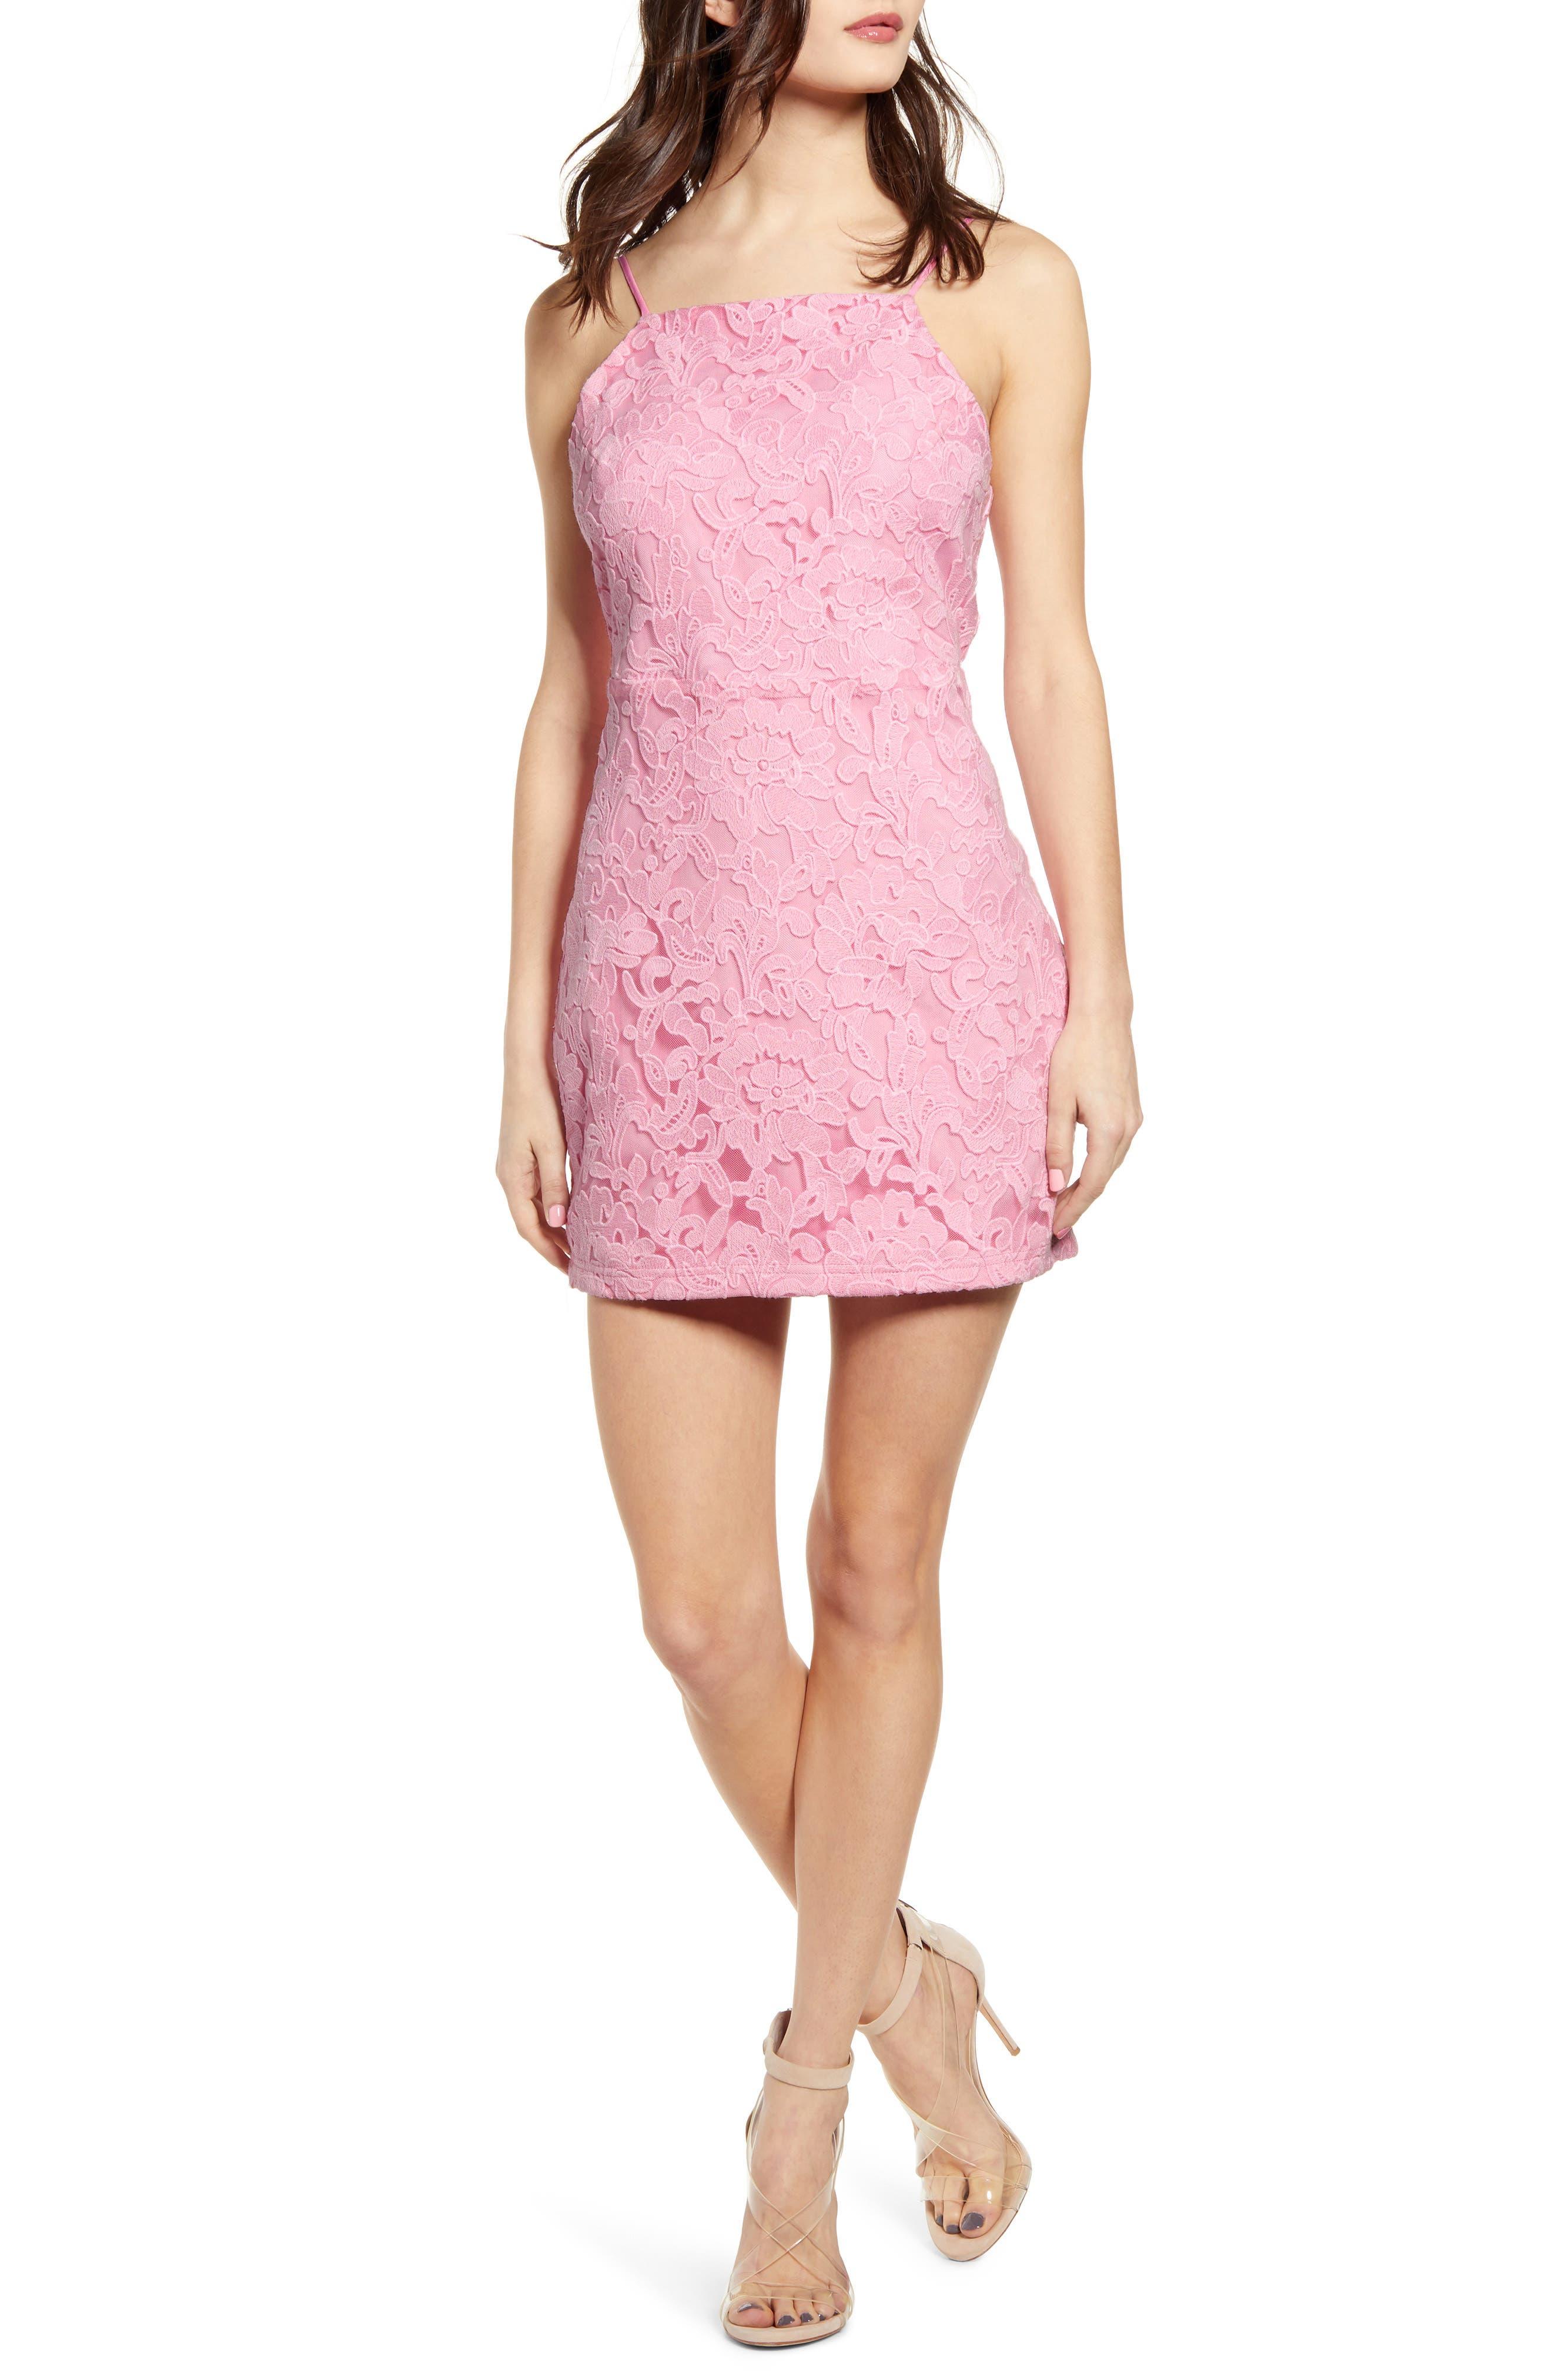 Endless Rose Cutout Back Minidress, Pink